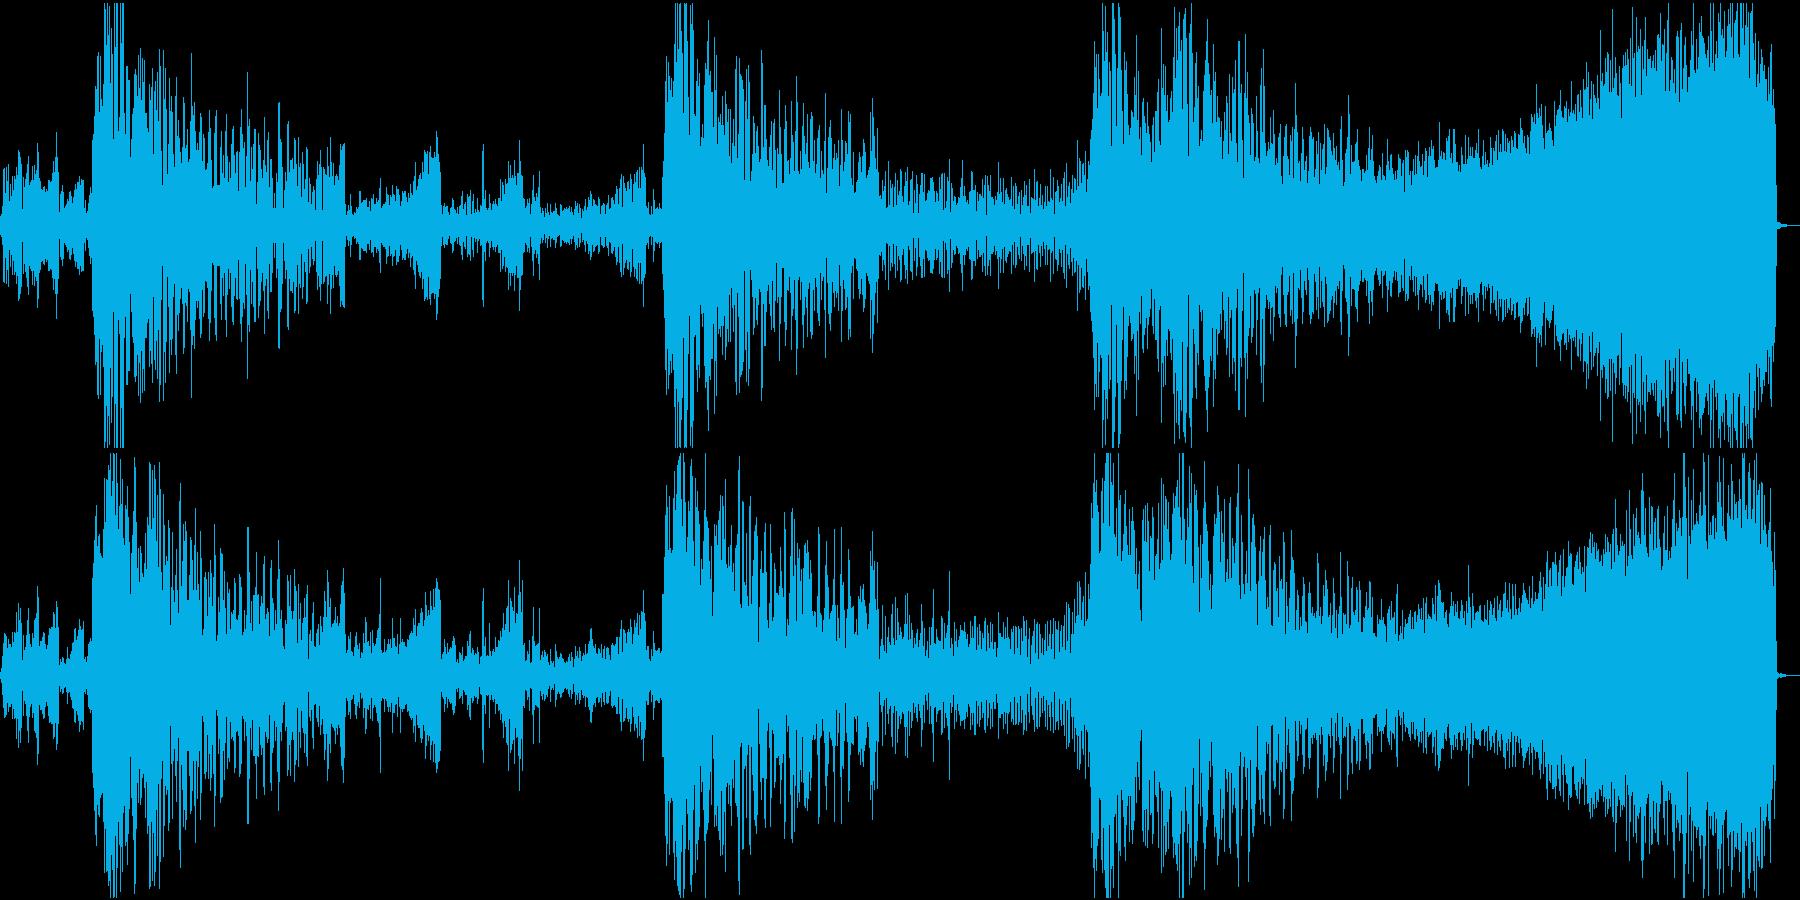 FMラジオ的ジングル3の再生済みの波形